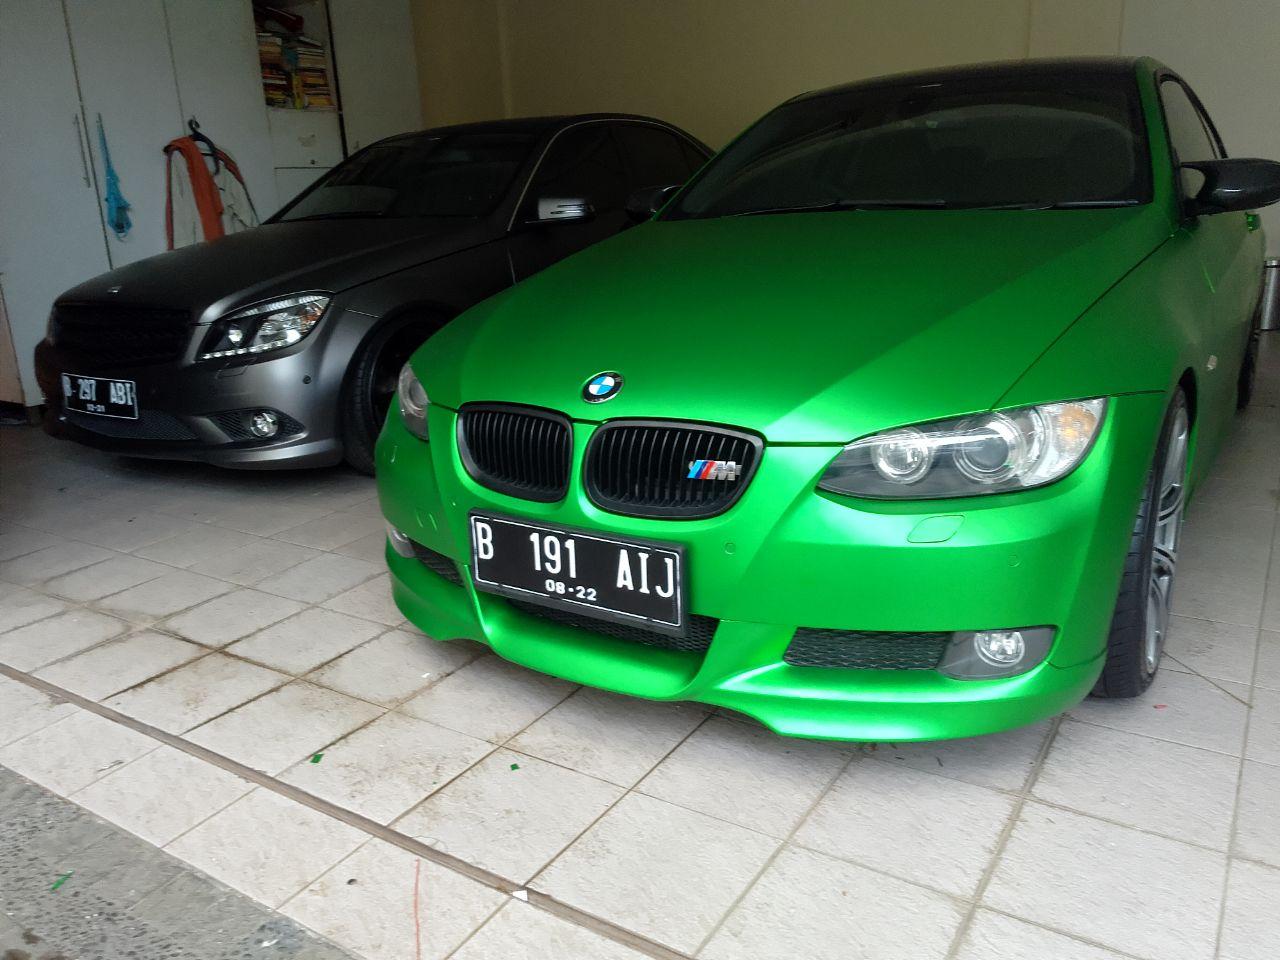 GCM-05 Green chrome metallic matte RS Premium wrapping